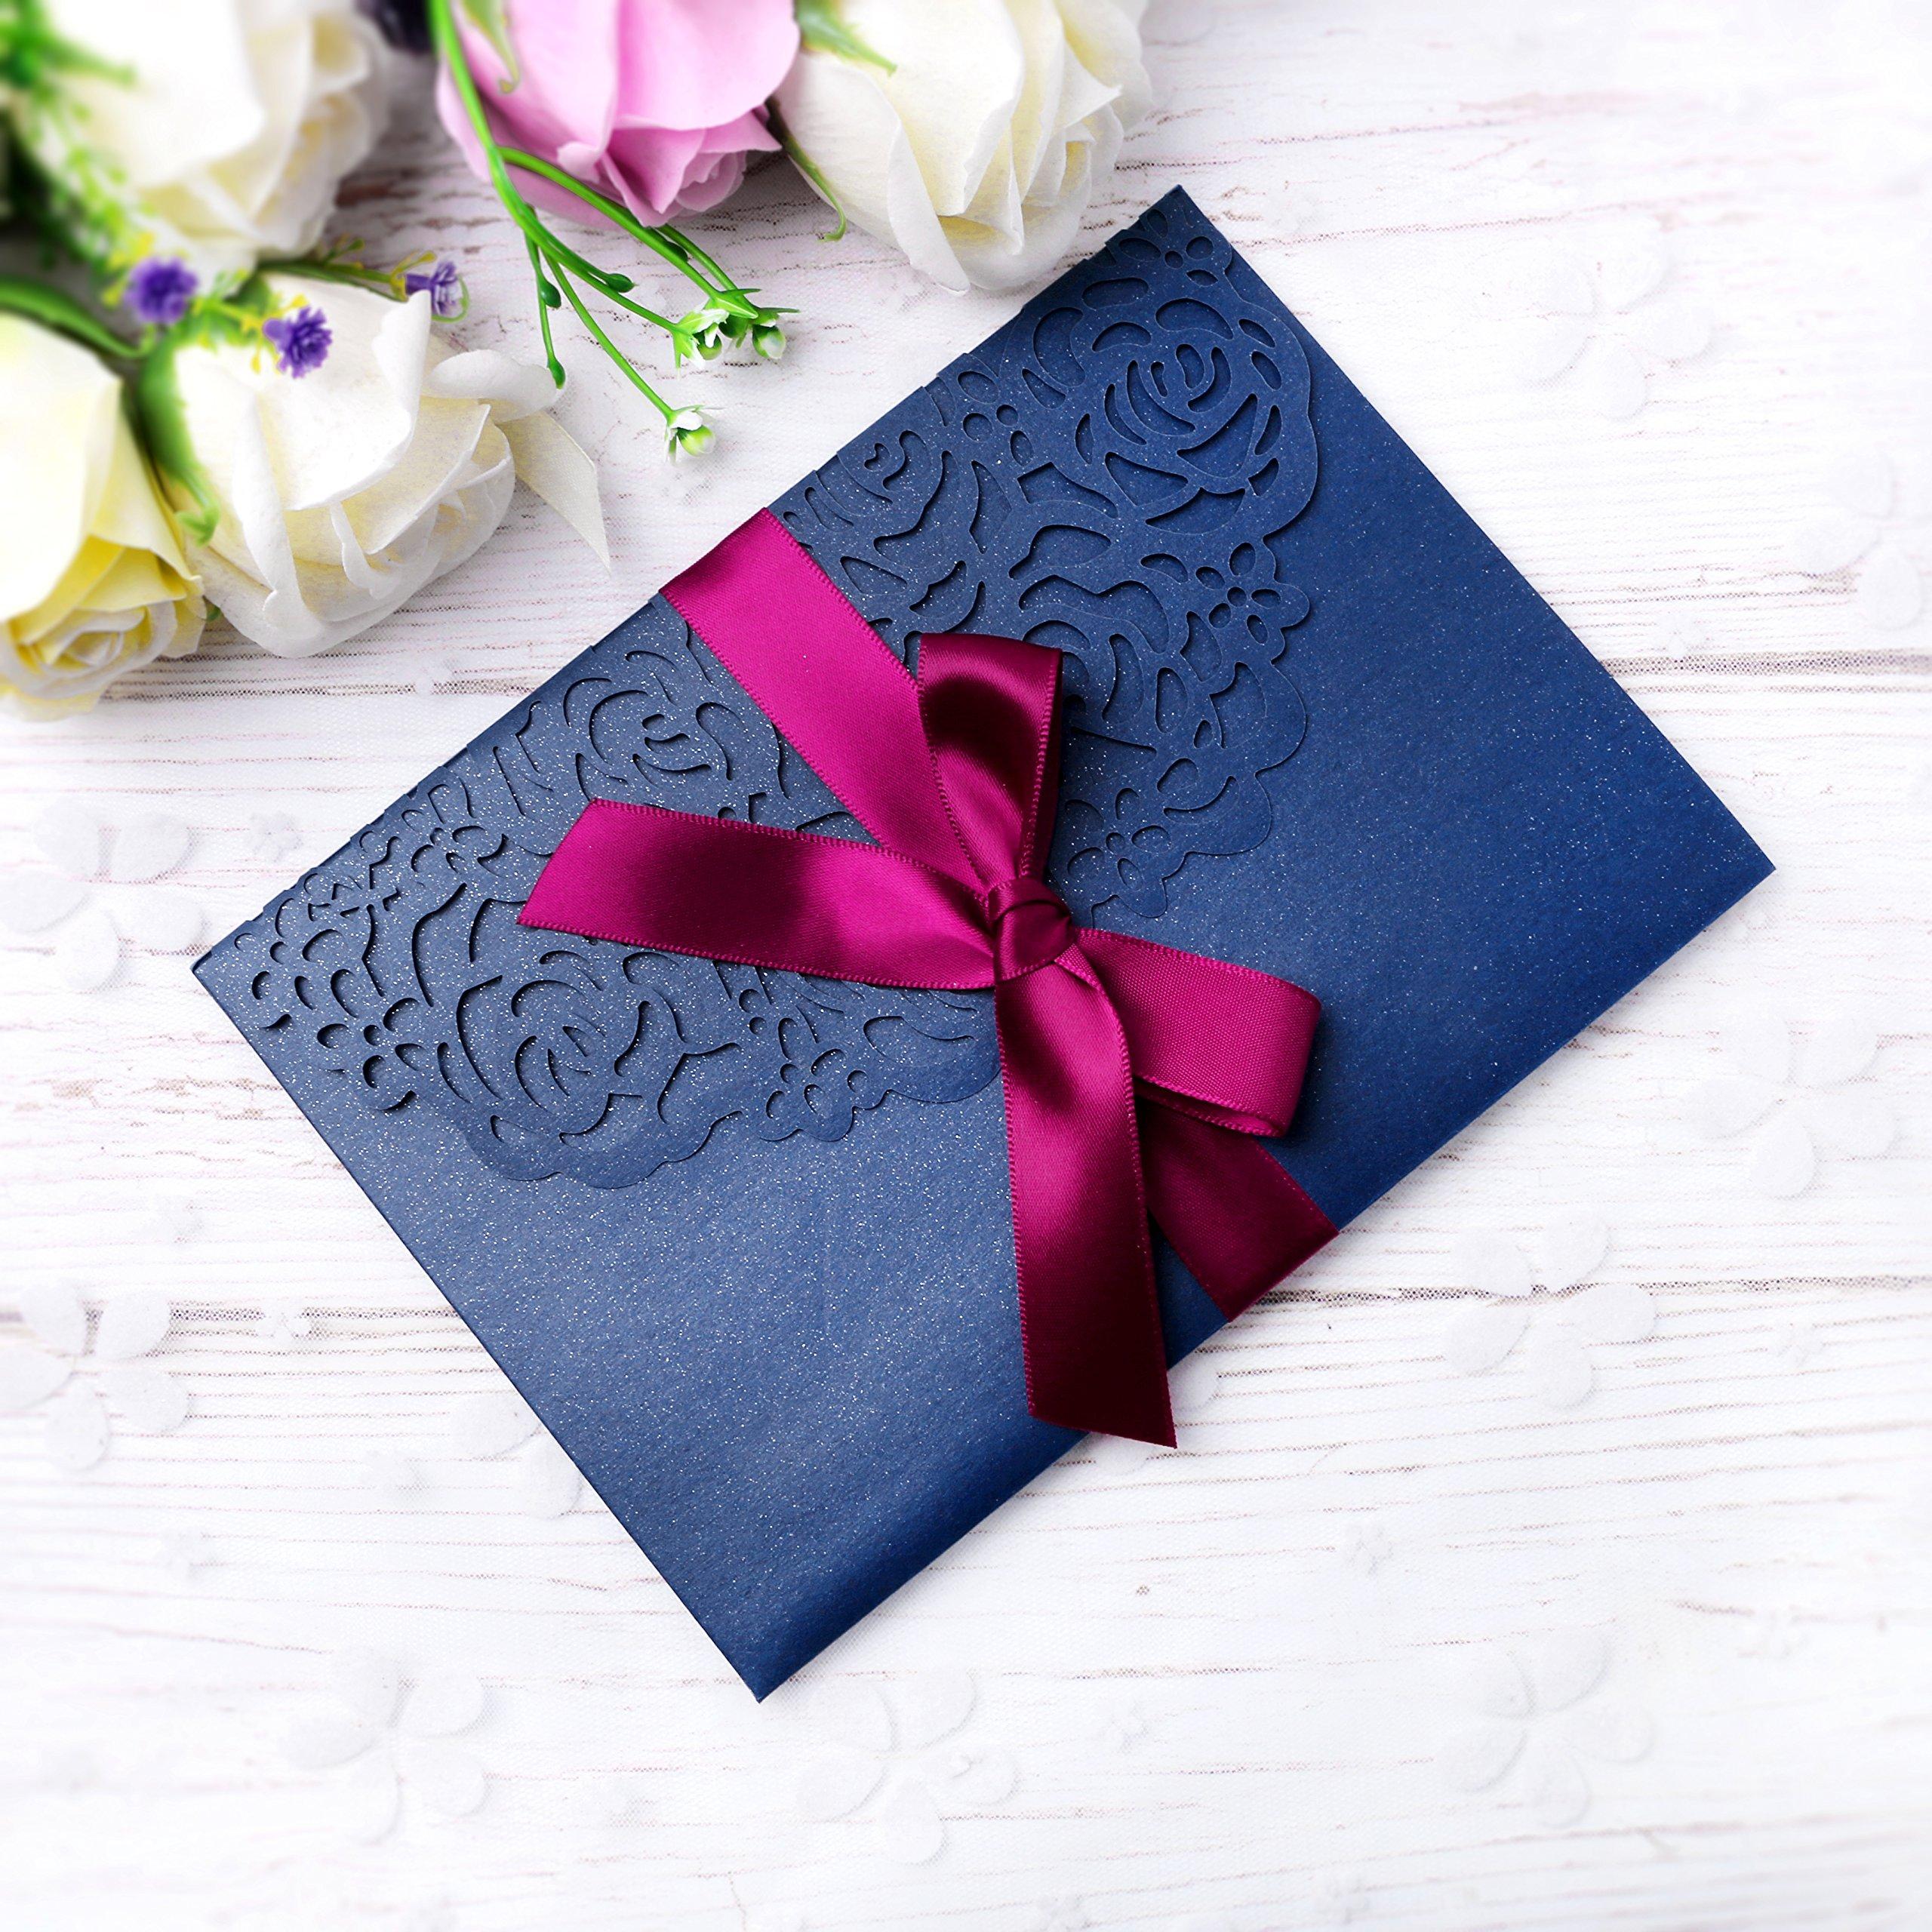 PONATIA 20 PCS 3 Folds 5x7'' Navy Blue Wedding Invitations Cards With Ribbons For Wedding Bridal Shower Engagement Birthday Graduation Invitation Cards (Navy Blue) by PONATIA